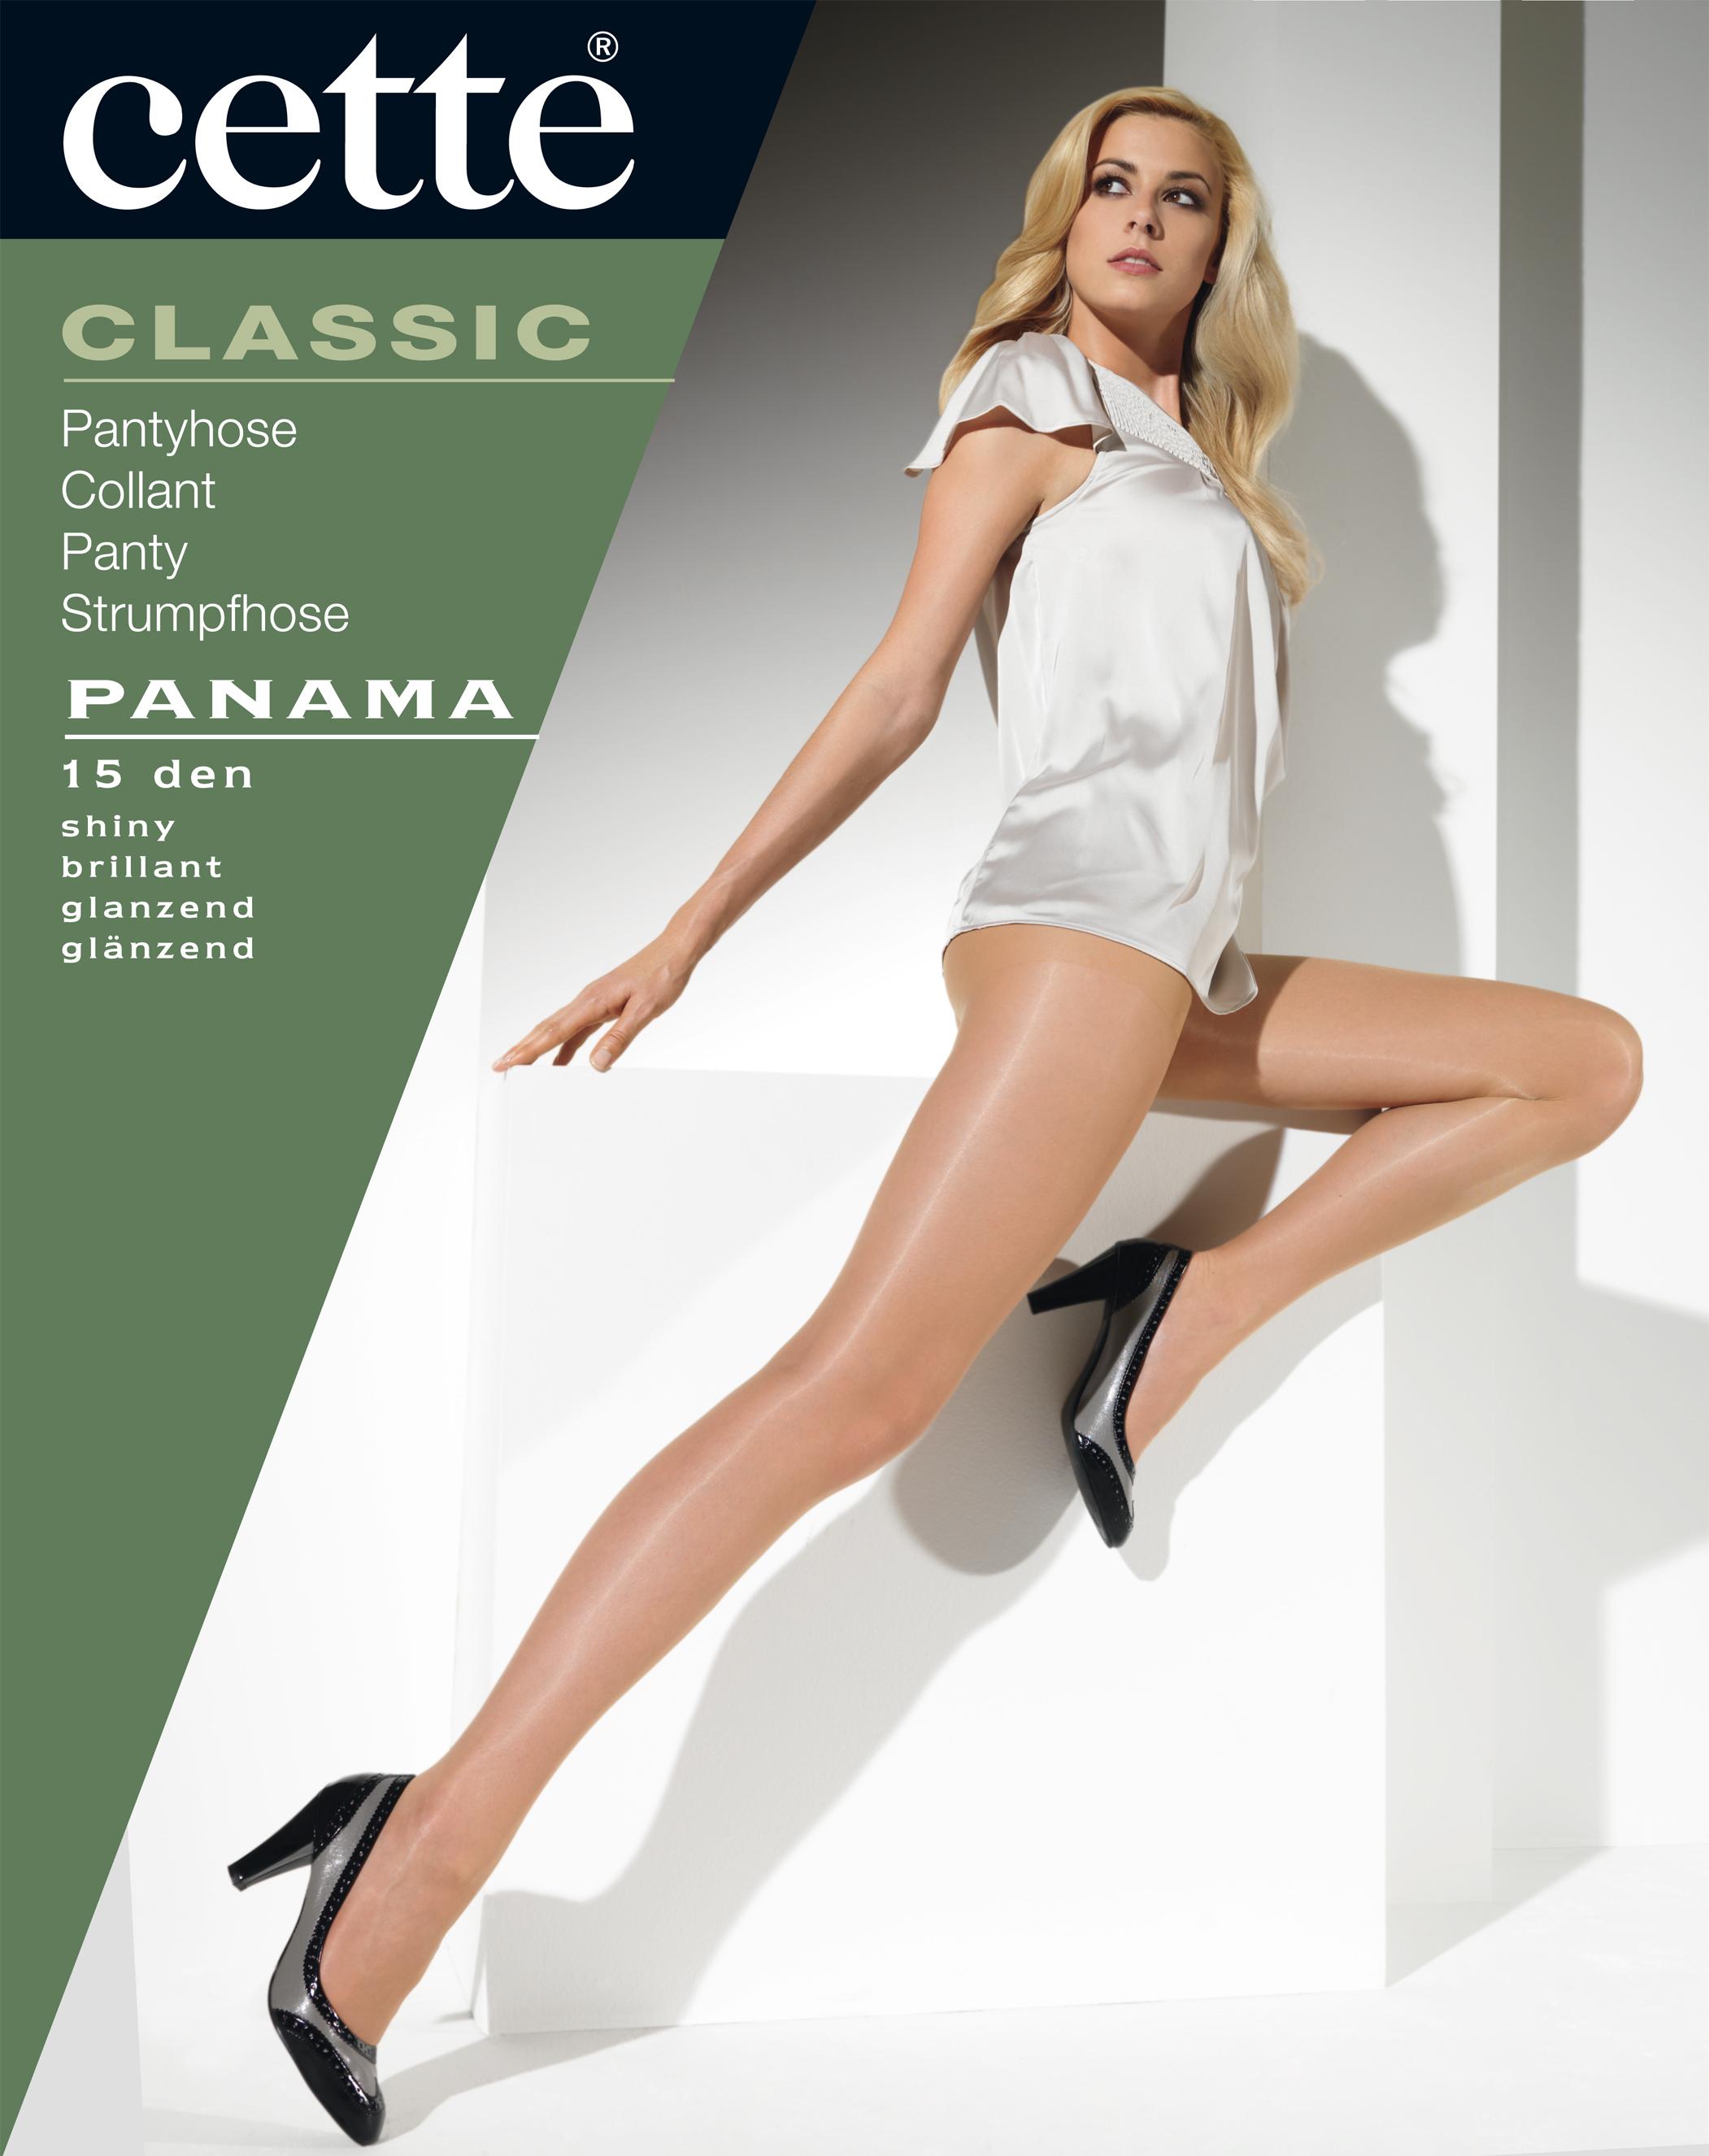 8d42bd8b6 Cette Panama - 15 denier gloss tights